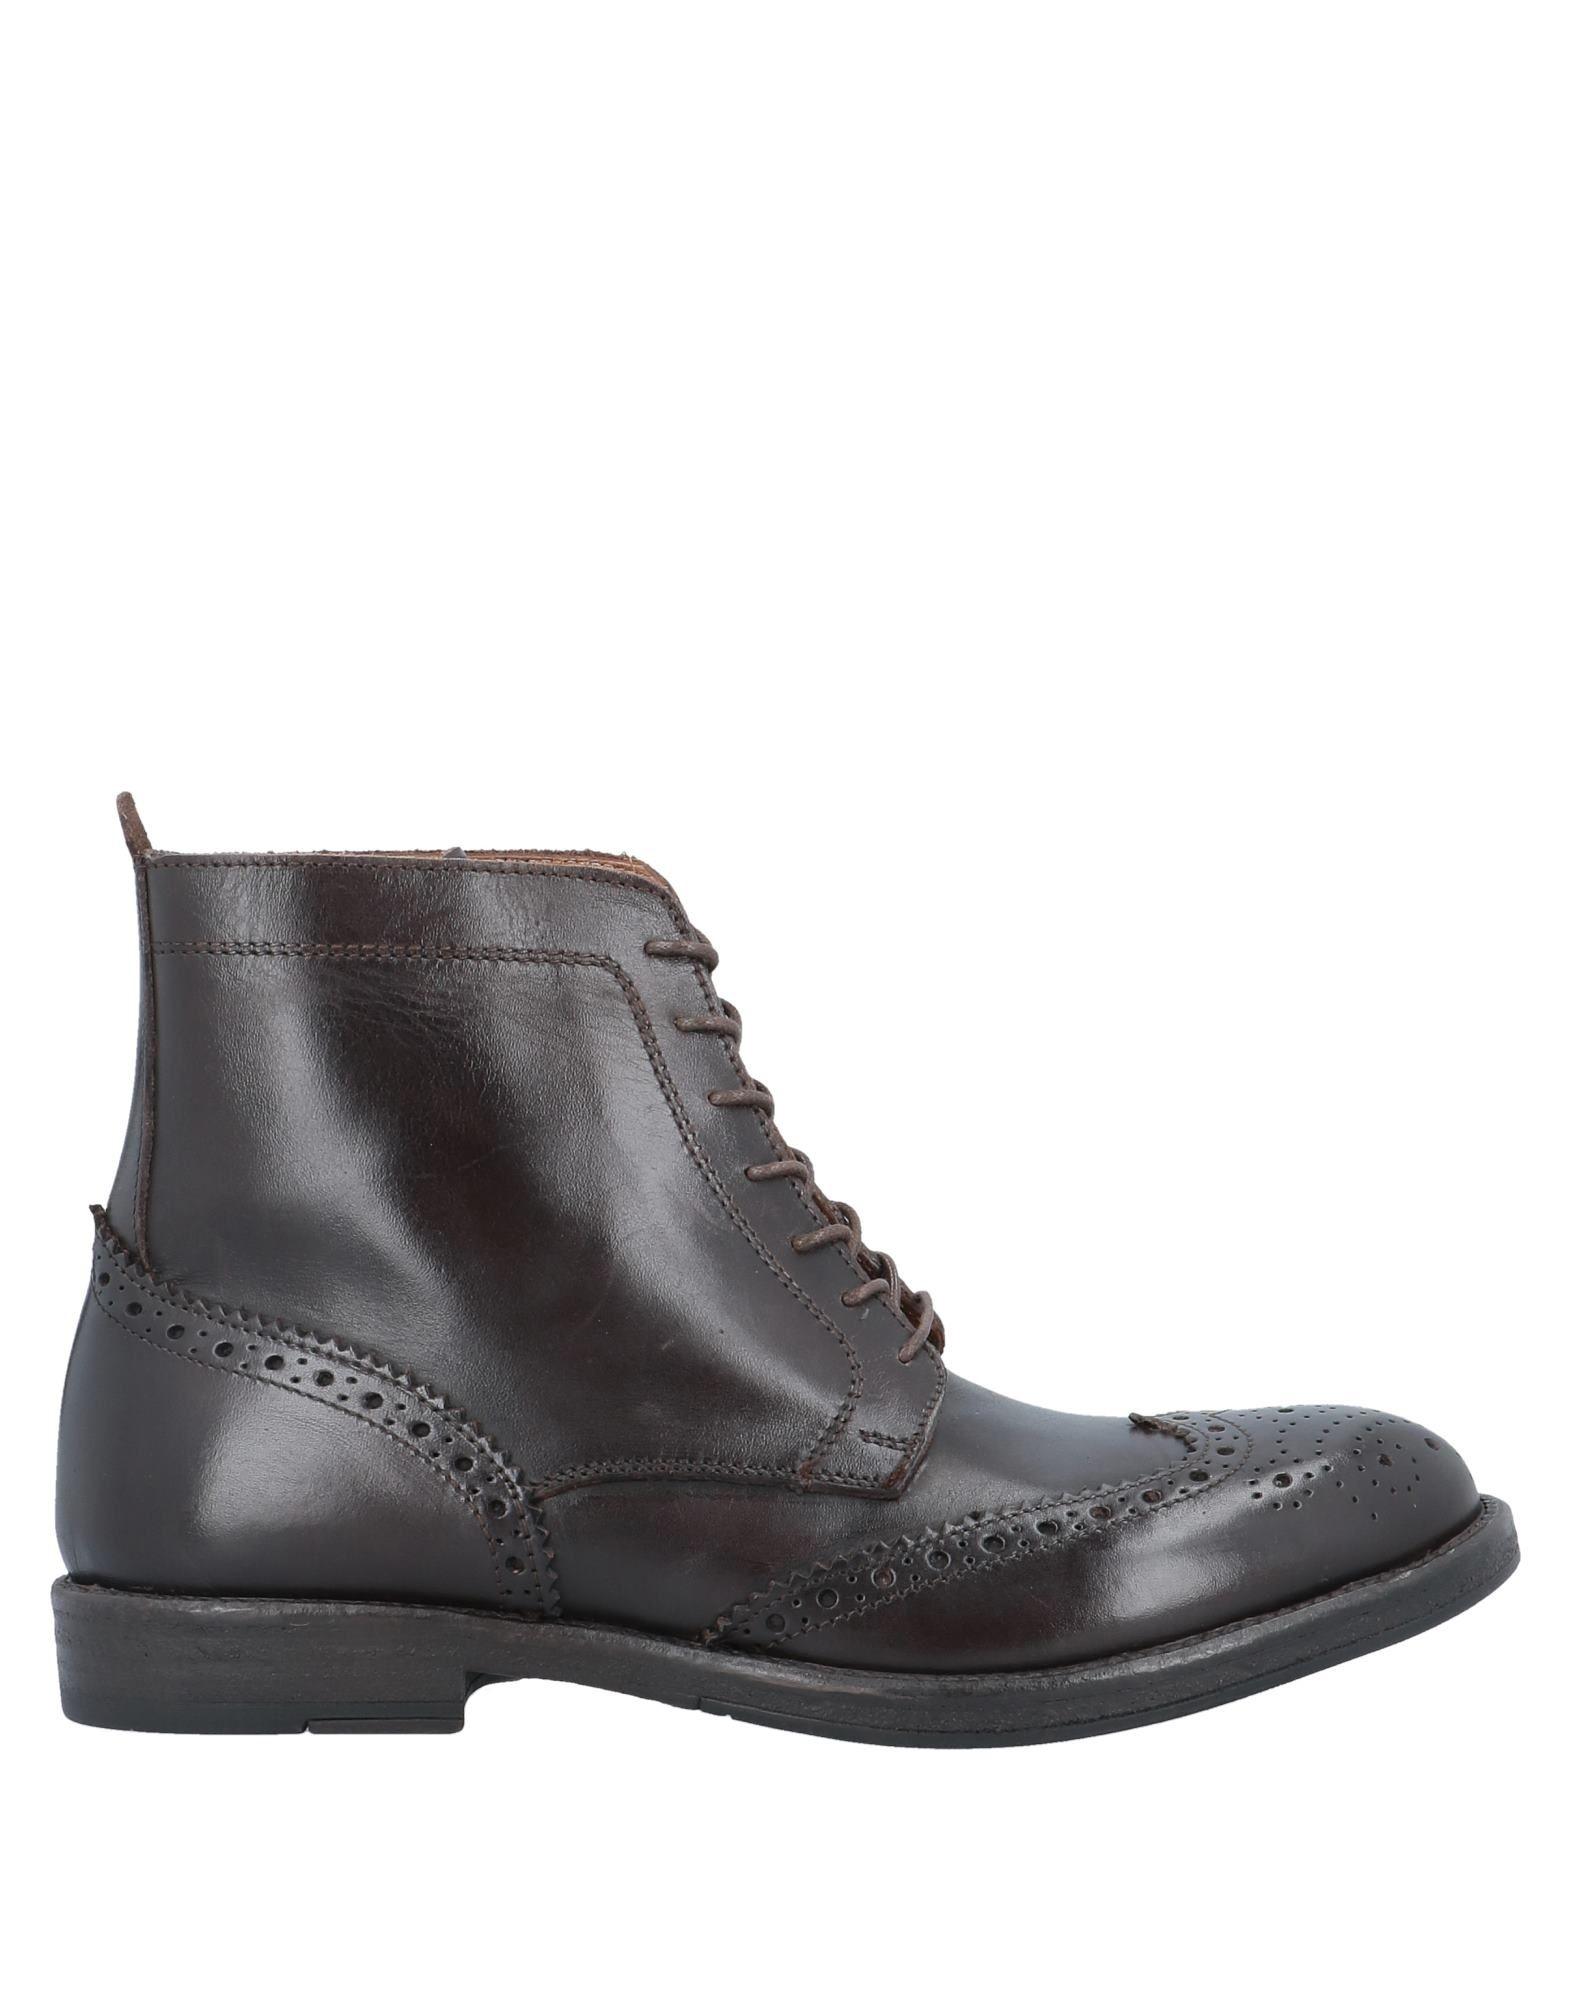 DONATO BOUTIQUE Полусапоги и высокие ботинки